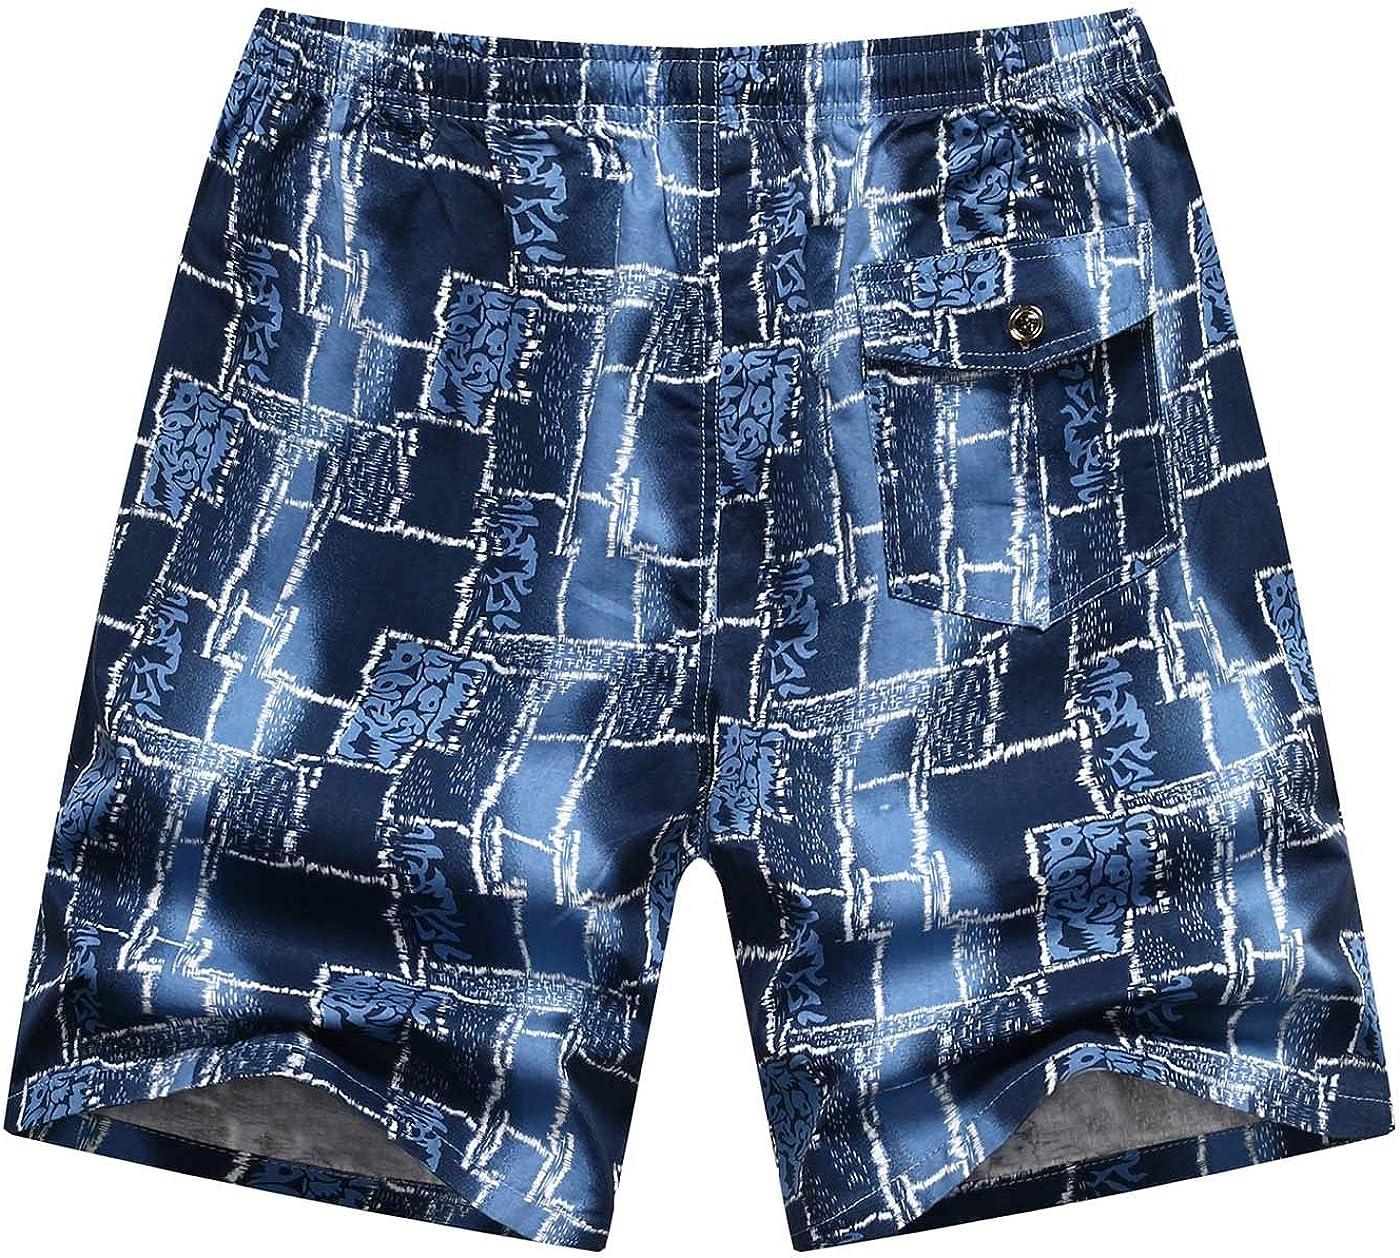 AIEOE Mens Summer Cotton Beach Boardshorts Casual Drawstring Zipper-Pockets Patterns Shorts